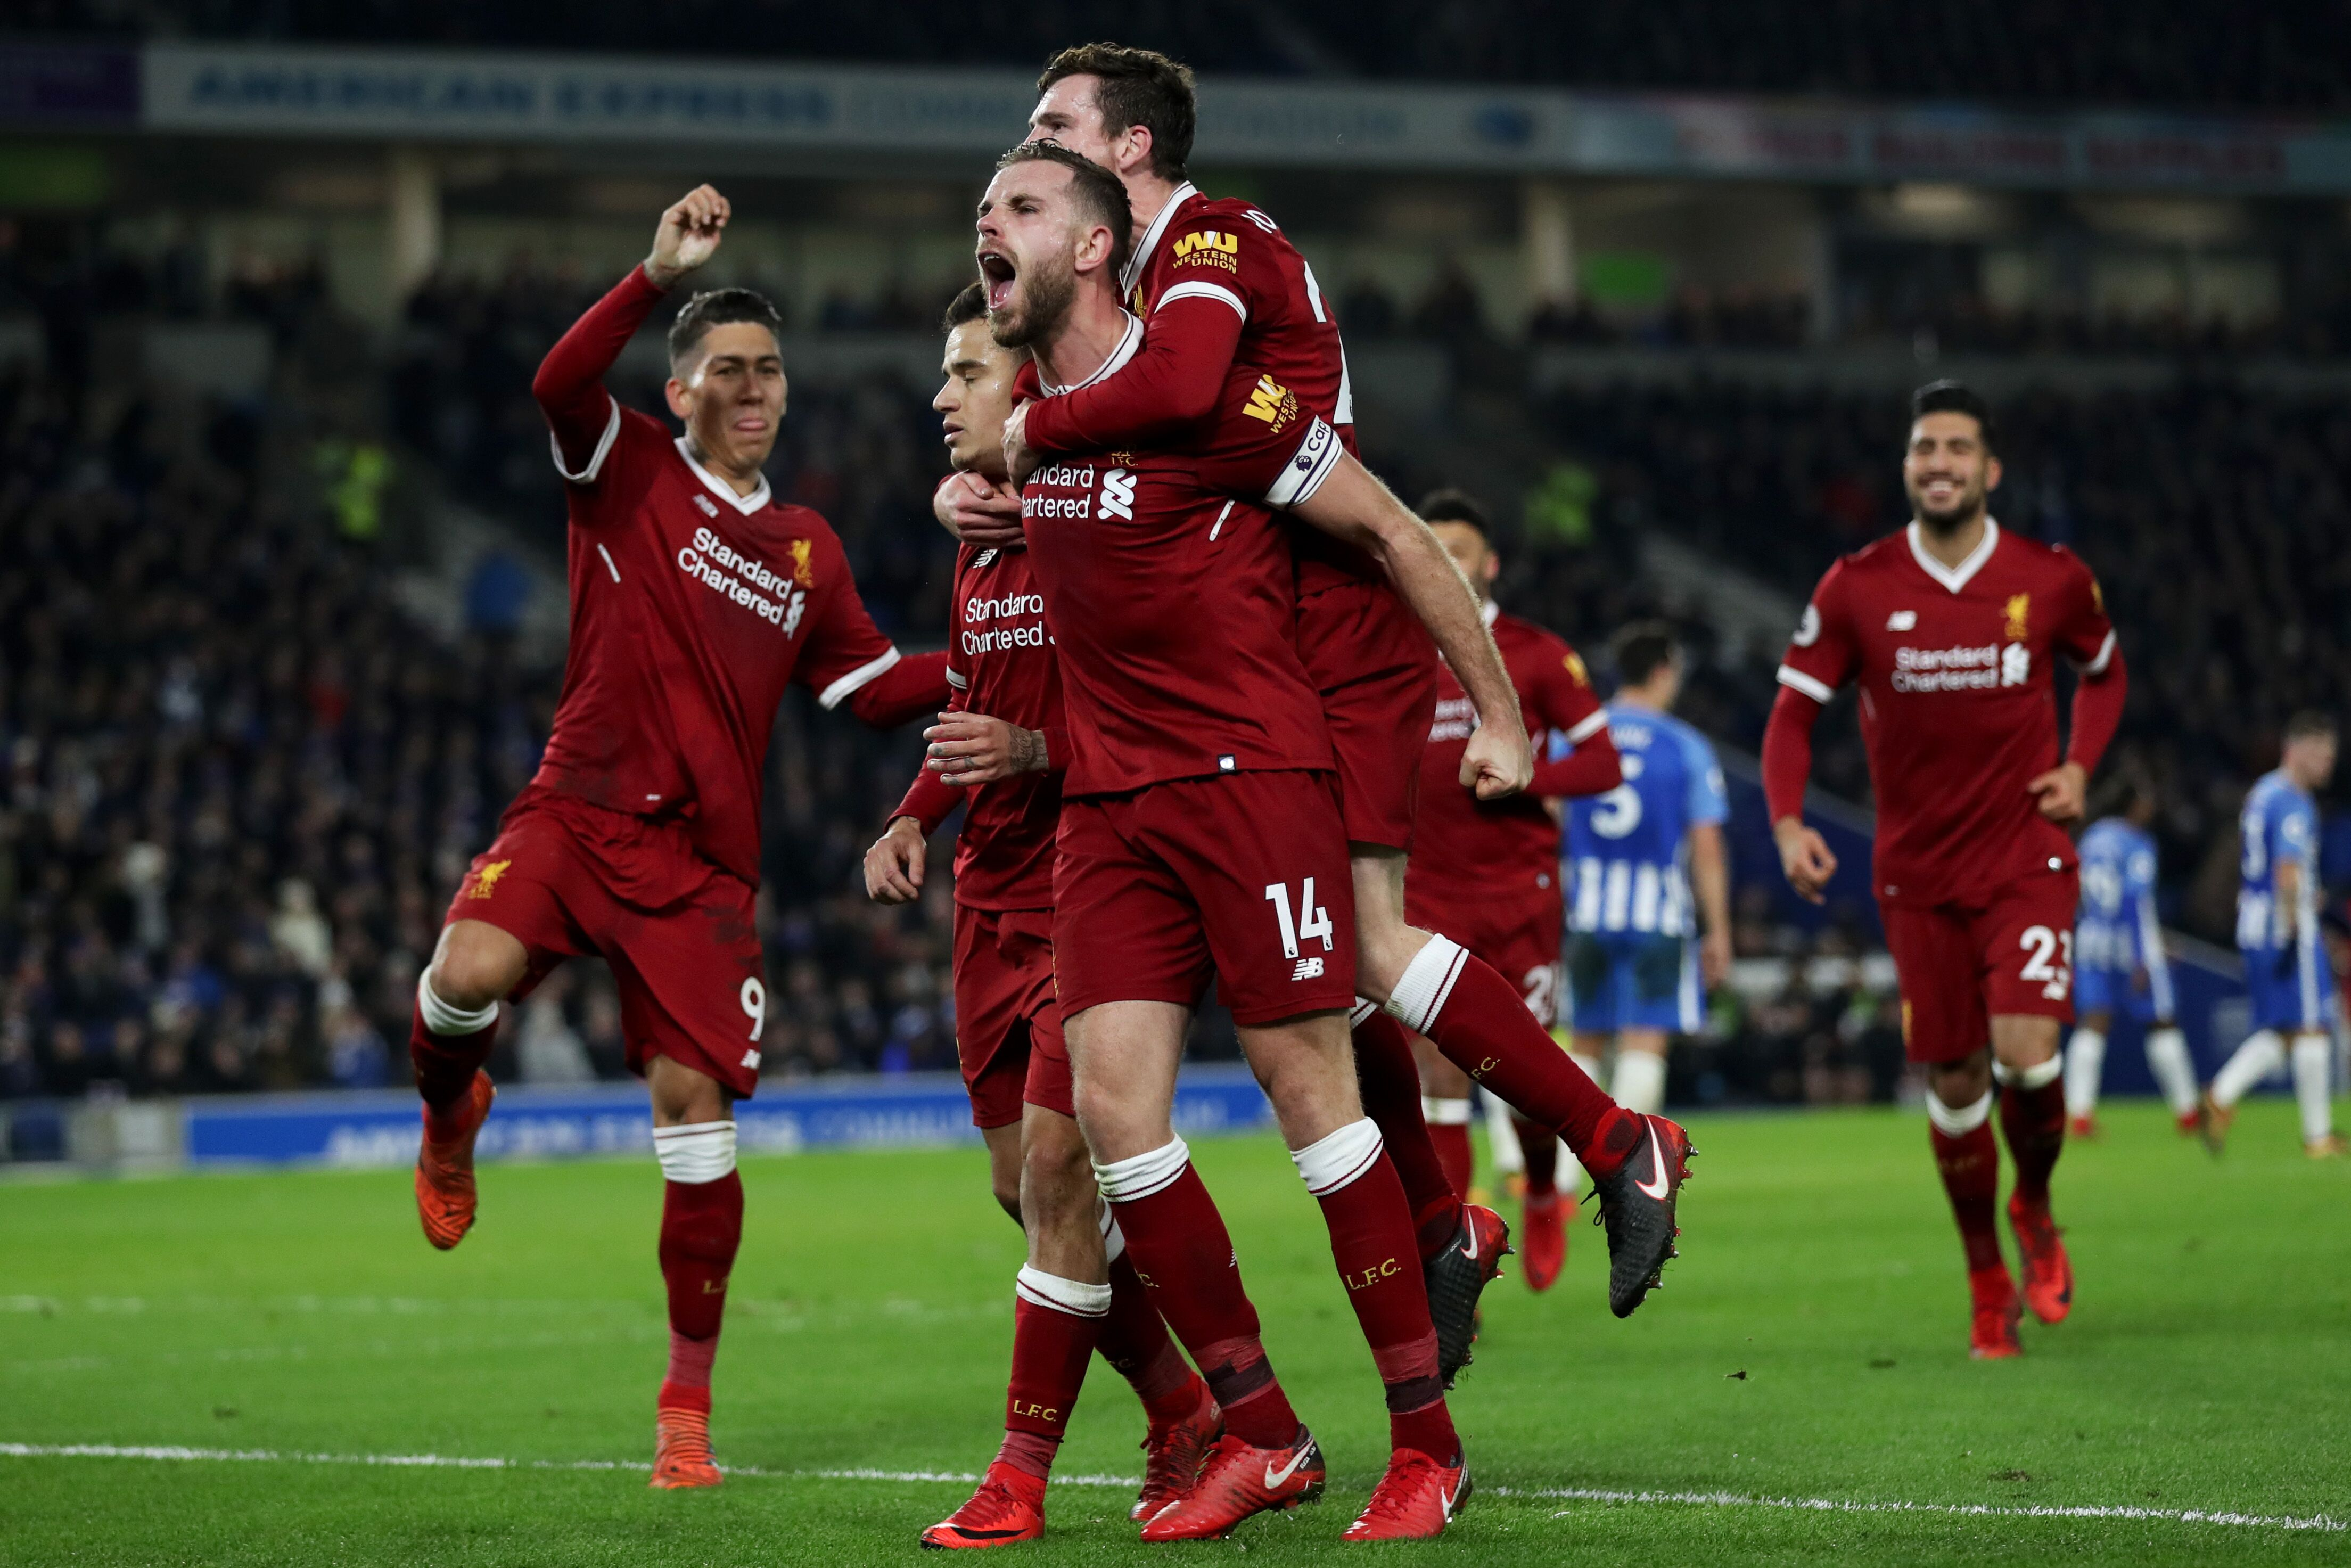 Liverpool Vs Bournemouth Live: Bournemouth Vs. Liverpool Live Stream: Watch Premier